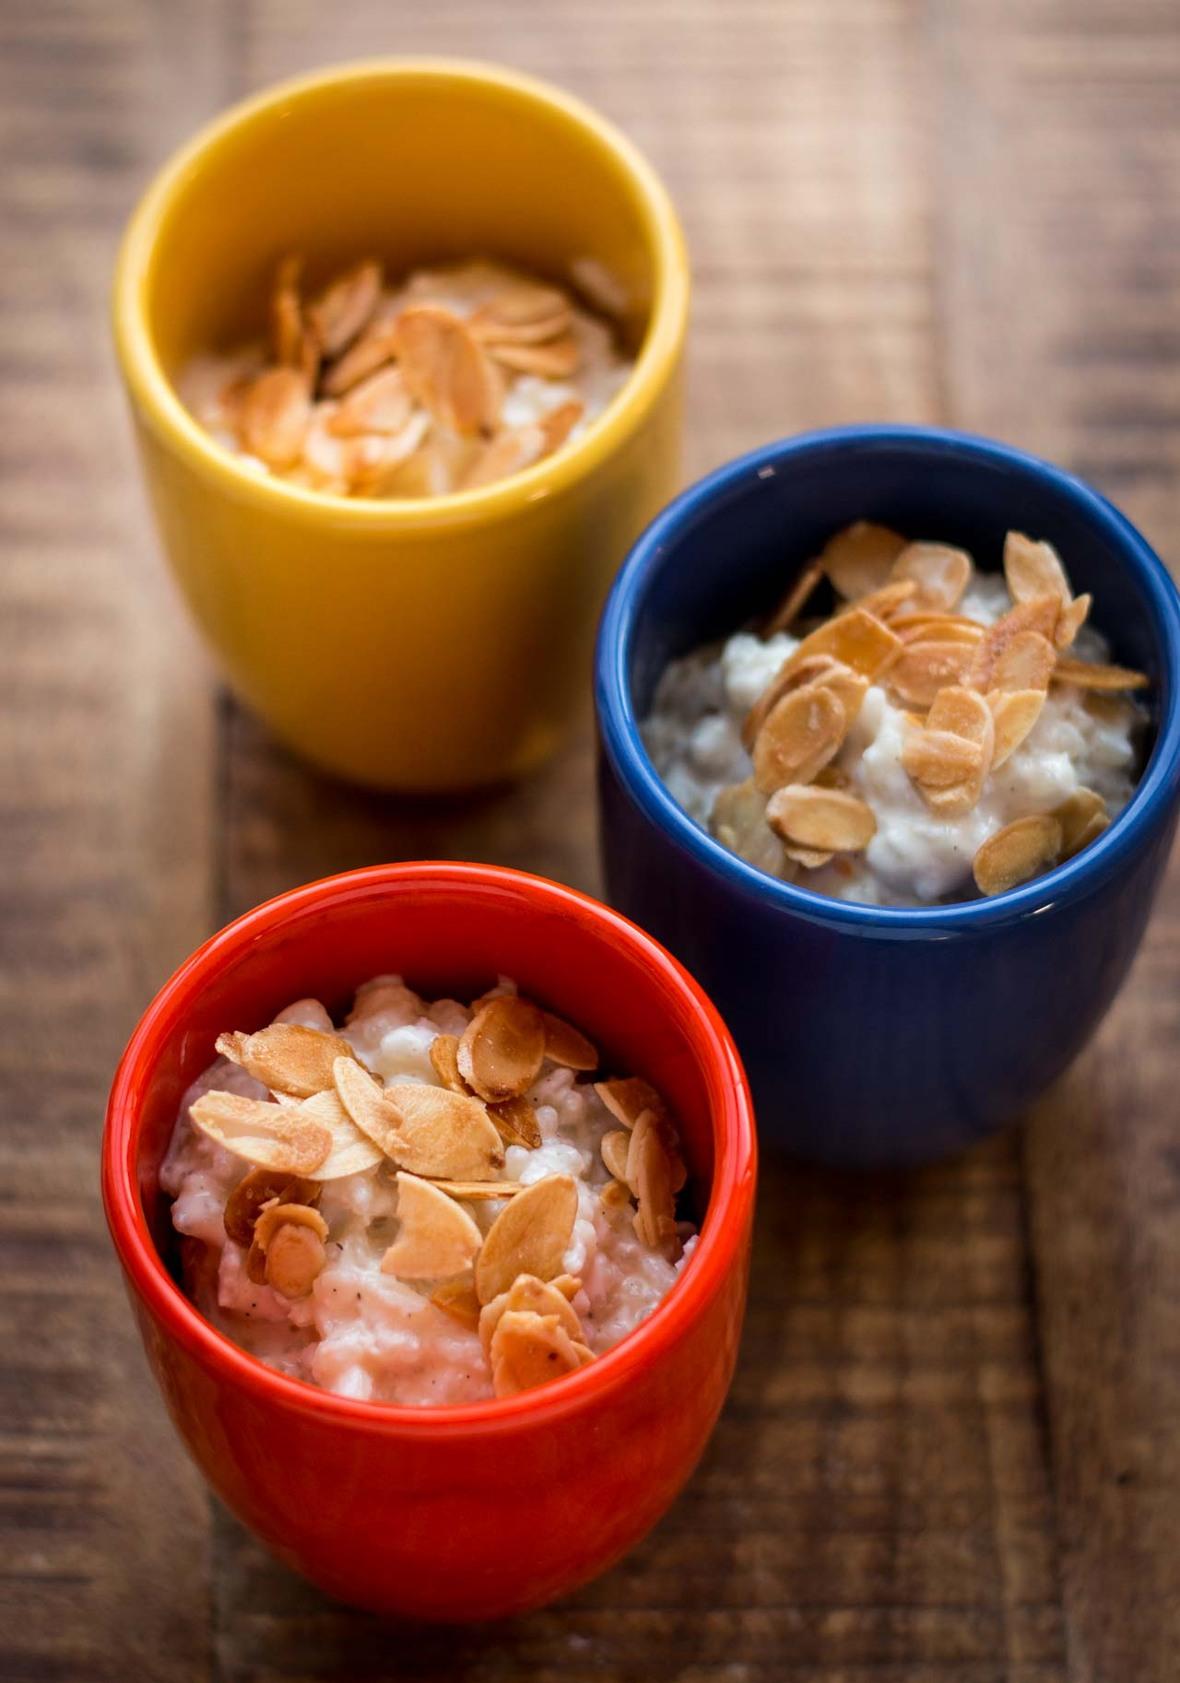 Riz-au-lait-french-rice-pudding-recipe-6